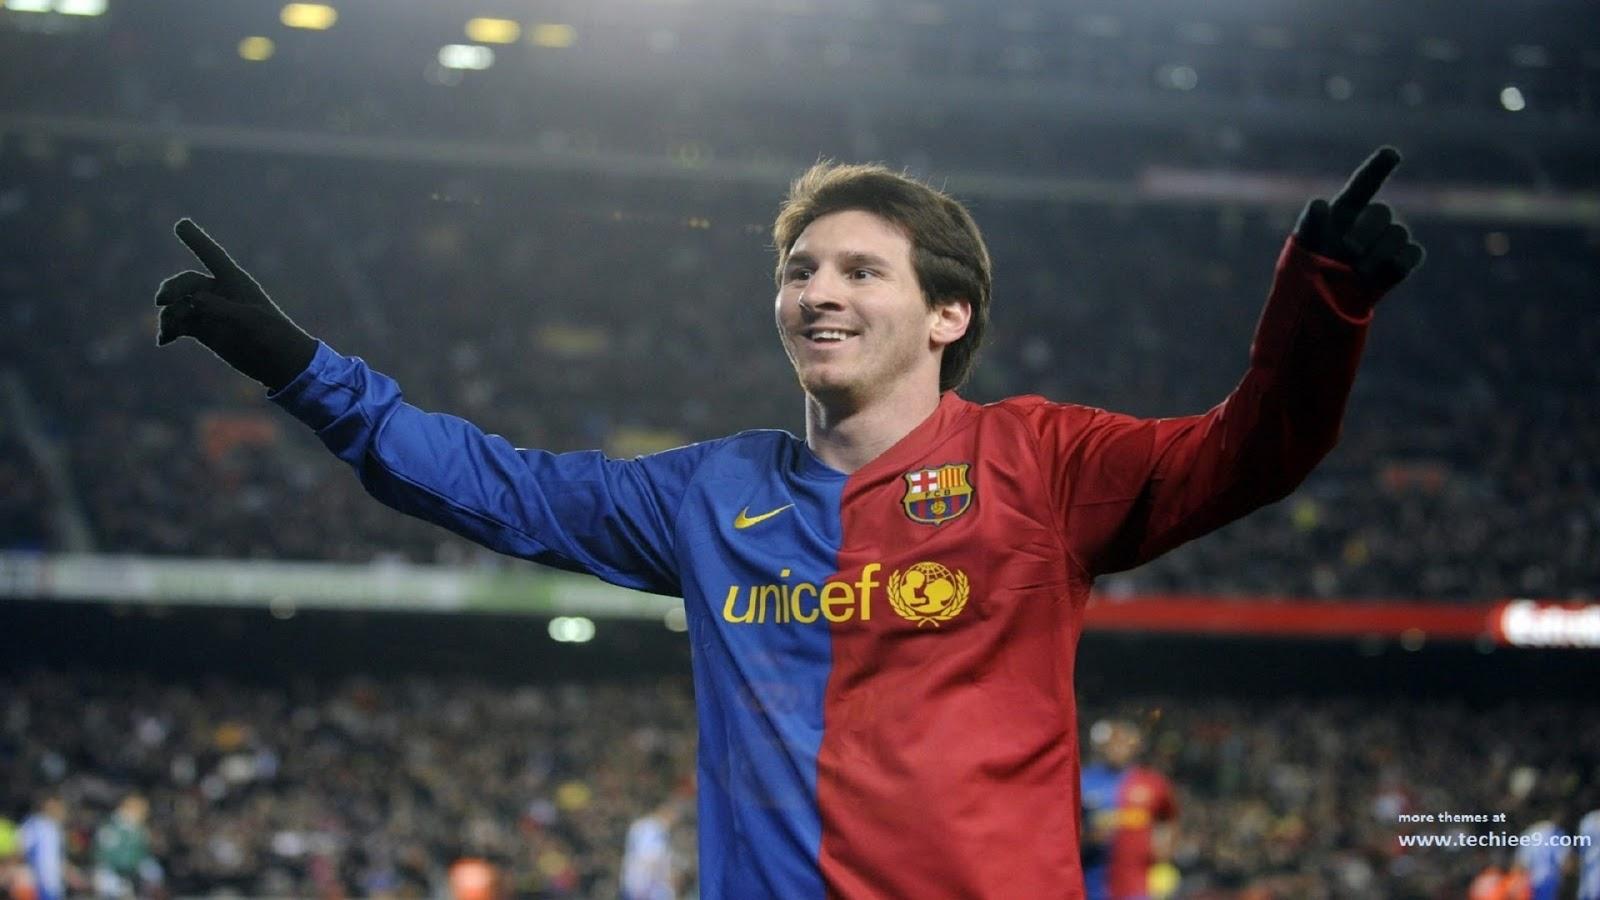 Lionel Messi full hd 1920x1080 widescreen wallpaper   hd wallpapers 1600x900